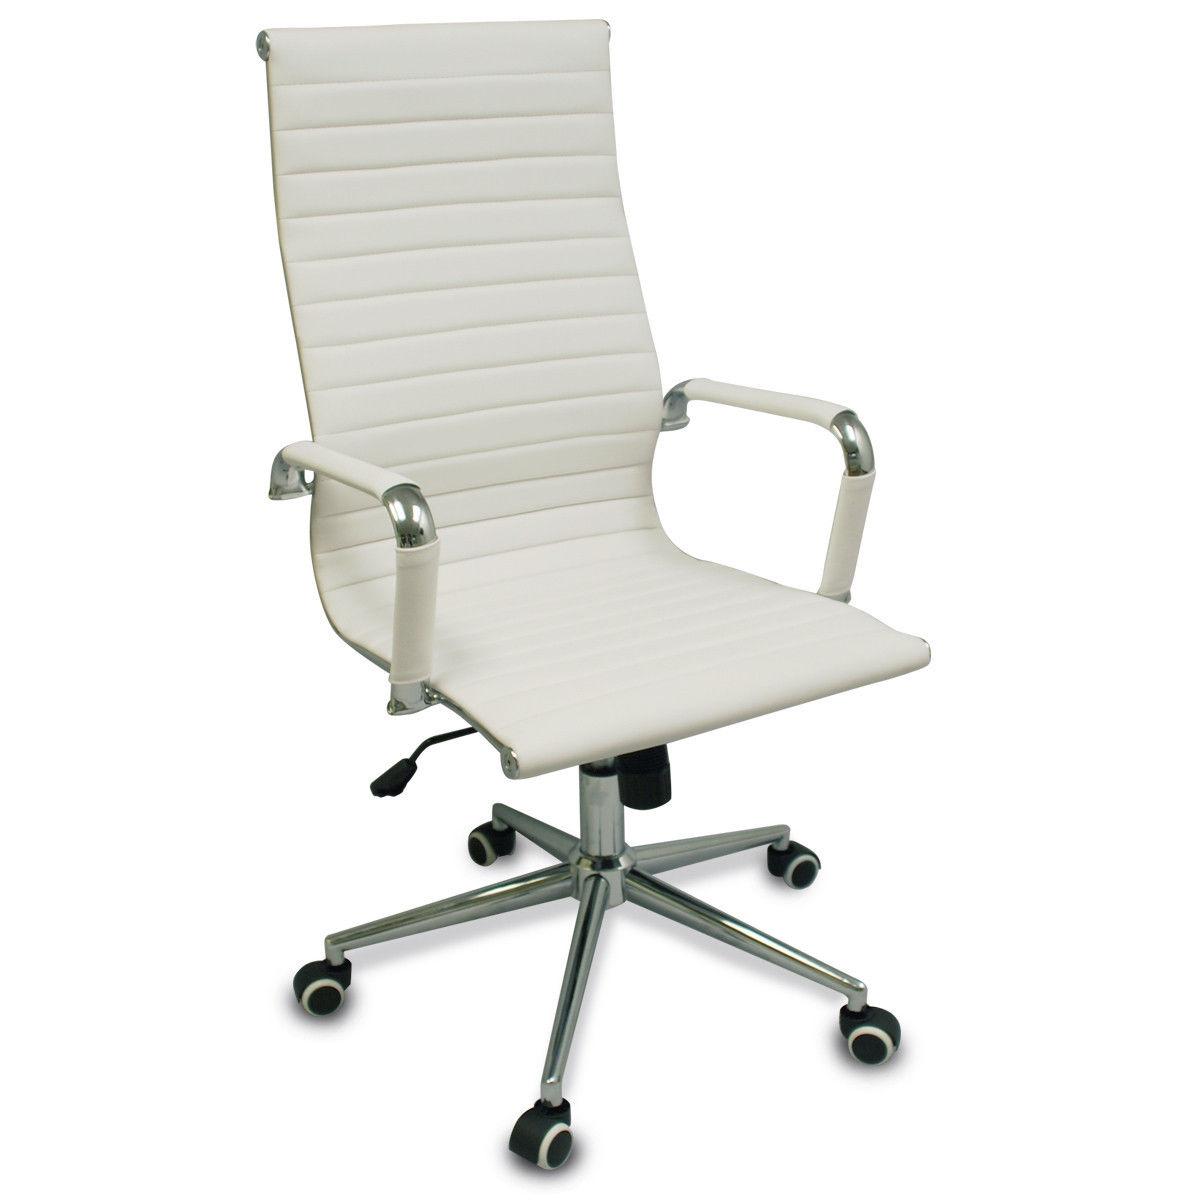 Chair Design Parameters Backpack Beach Target Verdrietvankortrijk Best Office